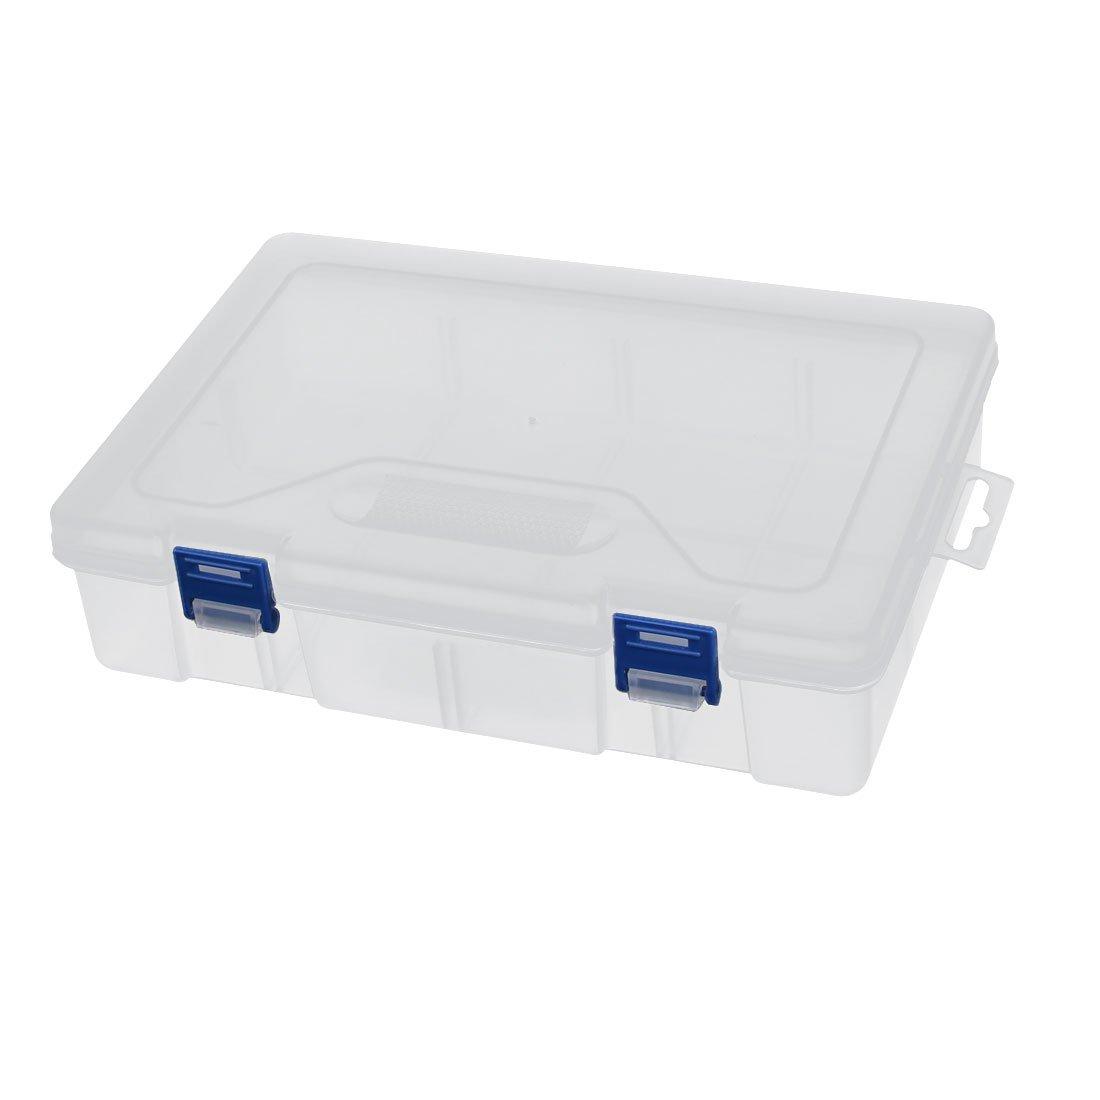 uxcell 240mmx160mmx58mm 8 Slot 2 Buckle Component Storage Organizer Empty Case DIY Tool